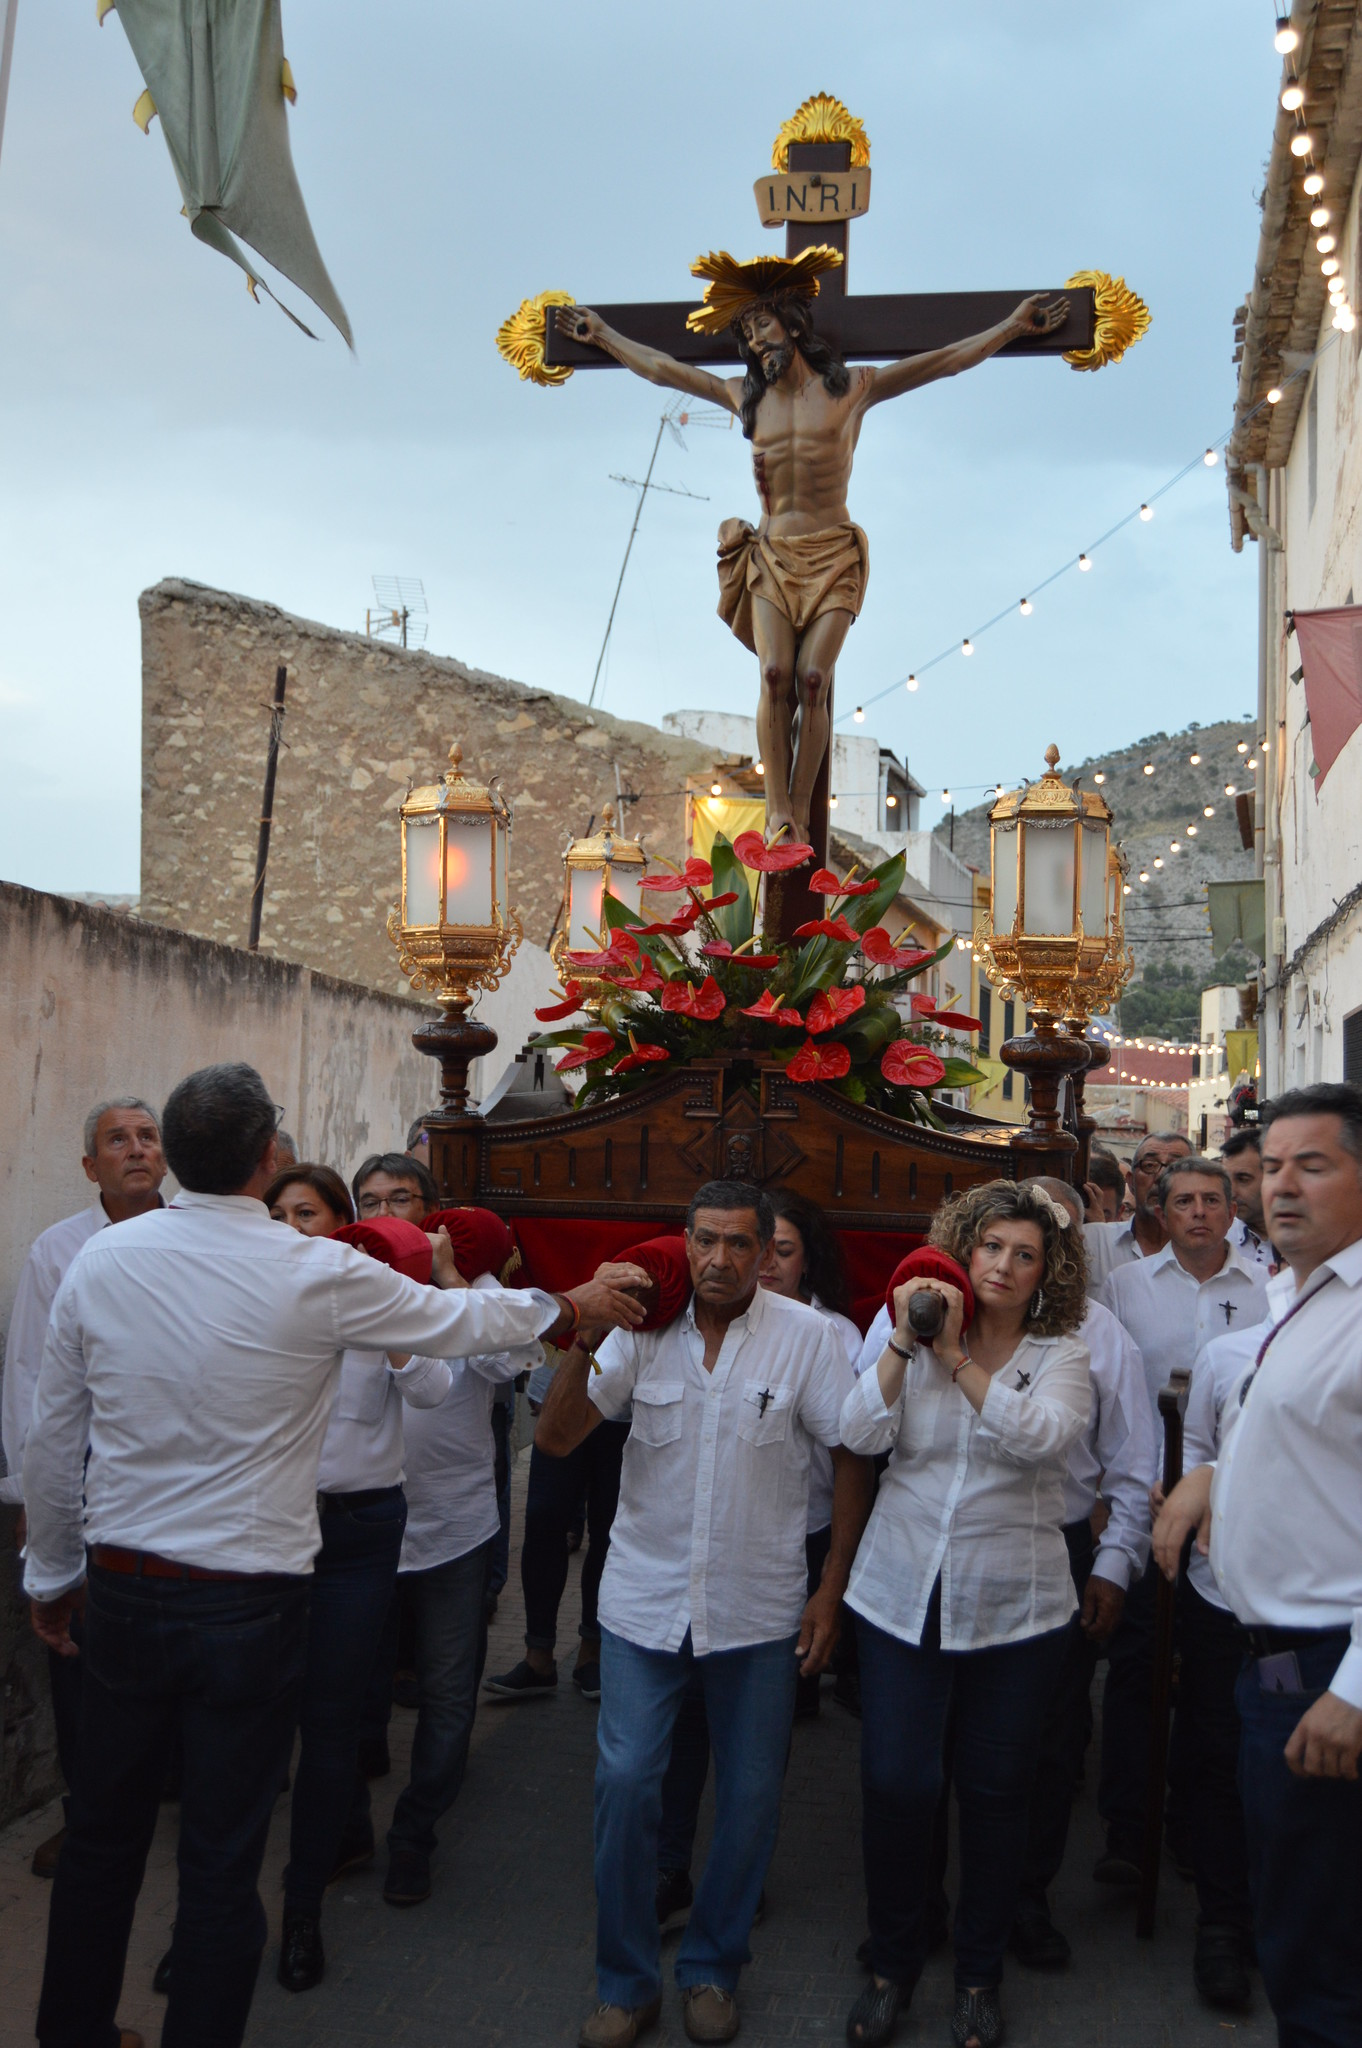 (2019-07-07) Procesión de subida - Adrián Romero Montesinos (25)